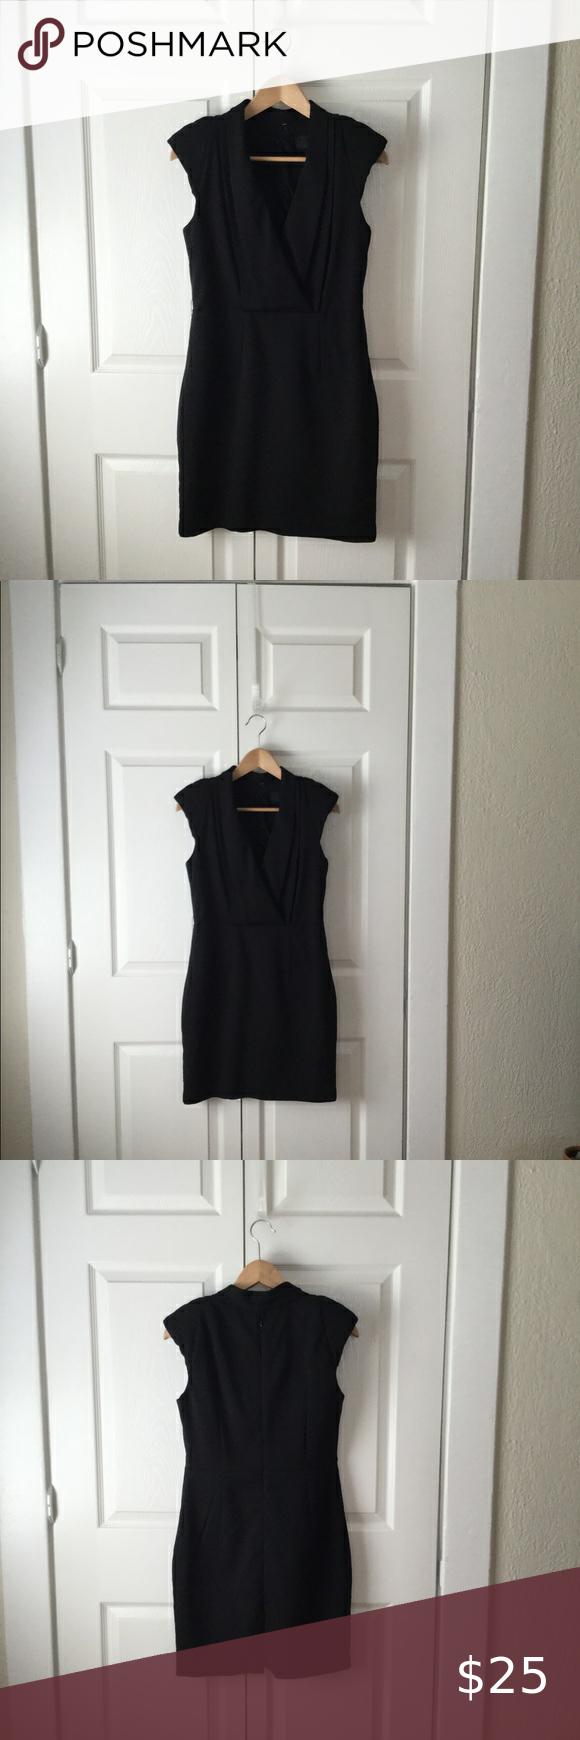 Arrogant Cat Black Sheath Dress Size 12 Workwear Black Sheath Dress Sheath Dress Work Wear [ 1740 x 580 Pixel ]